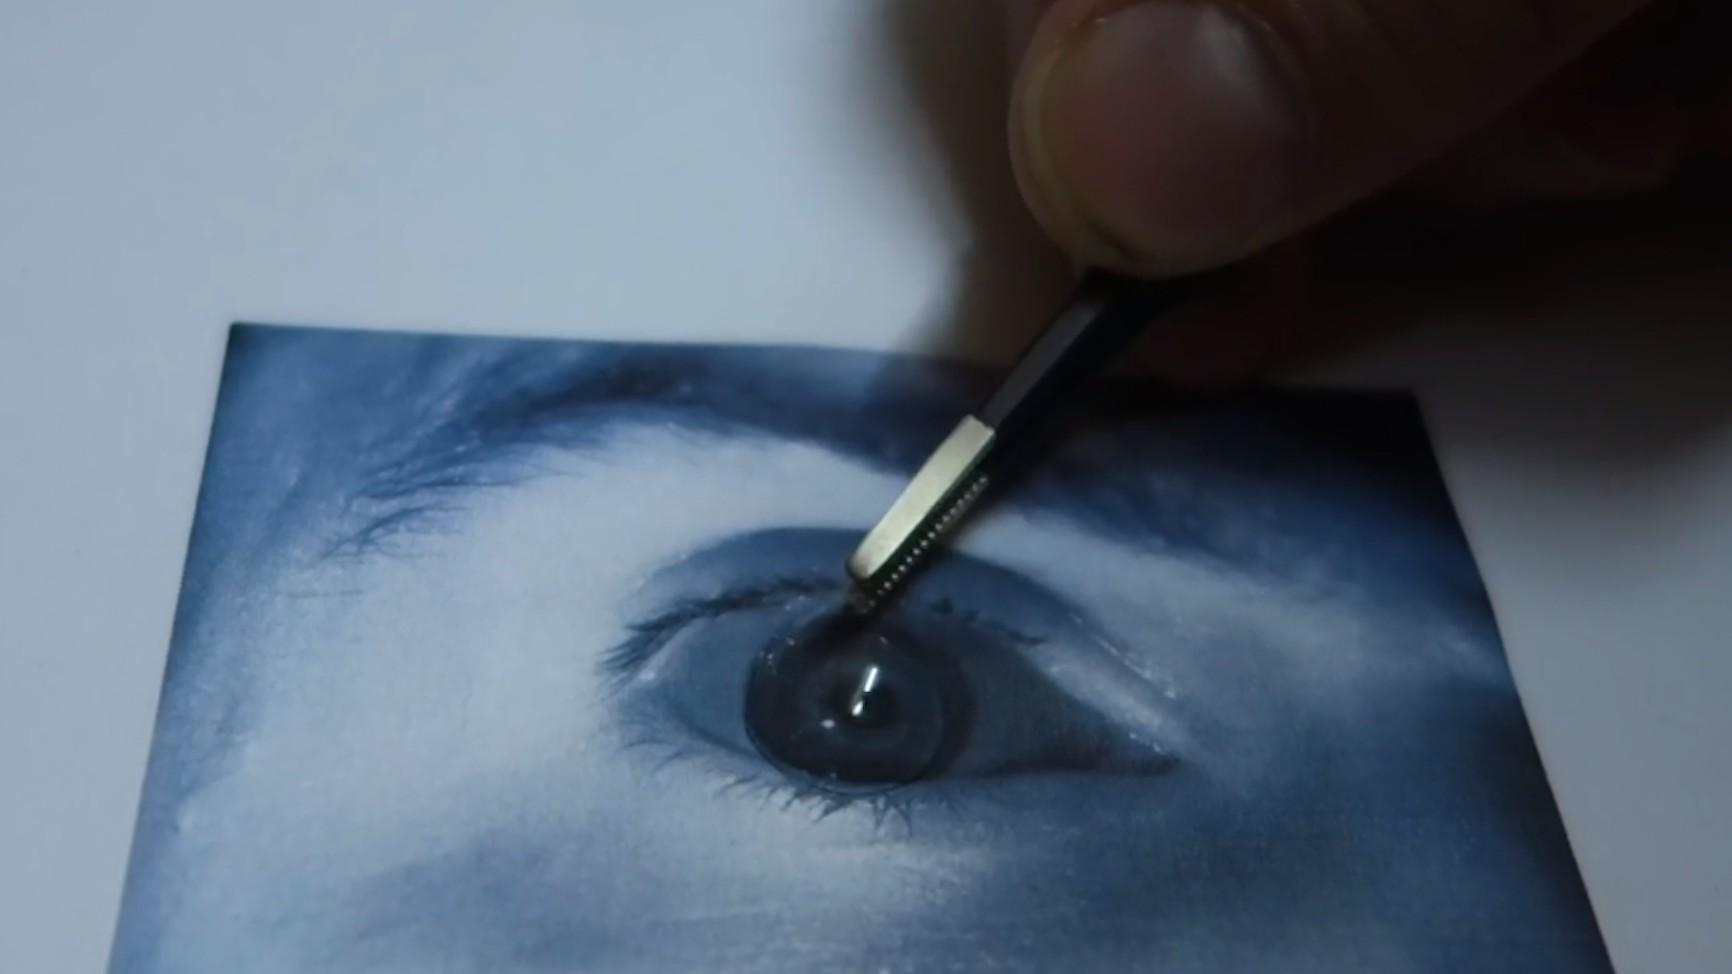 Hackers Unlock Samsung Galaxy S8 With Fake Iris